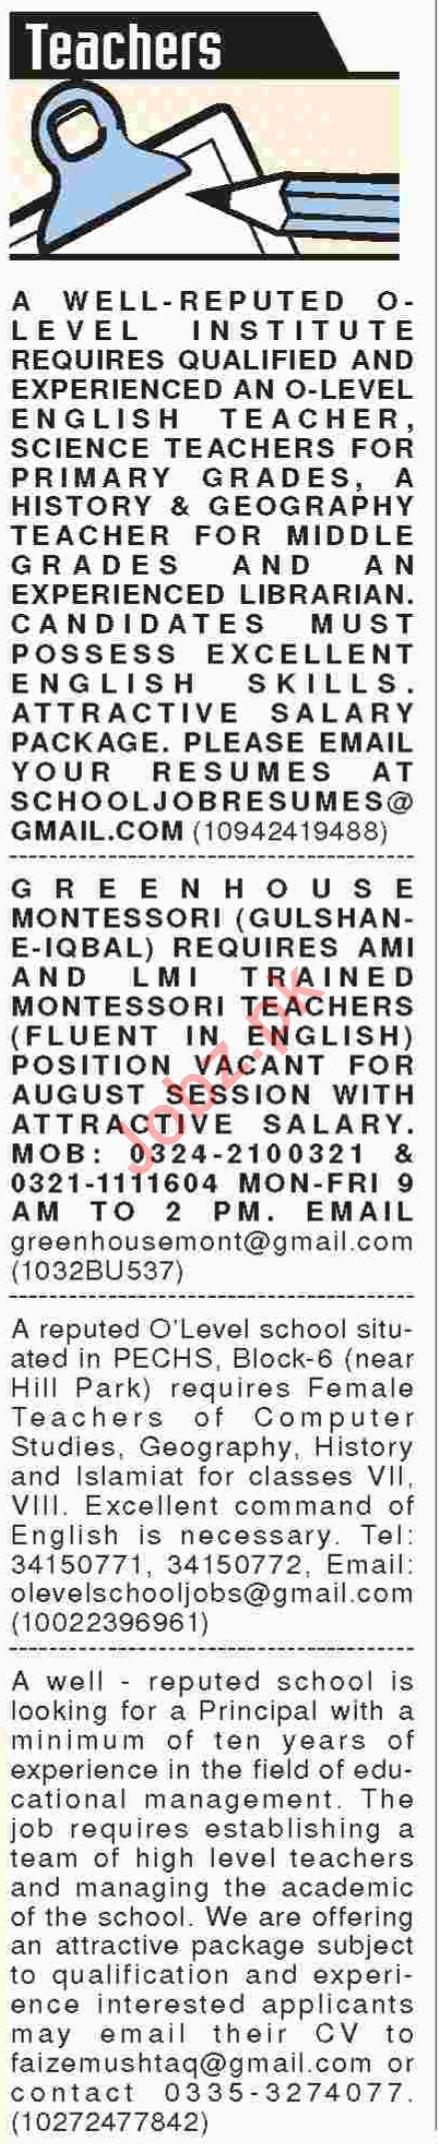 Teaching staff for Montessori School